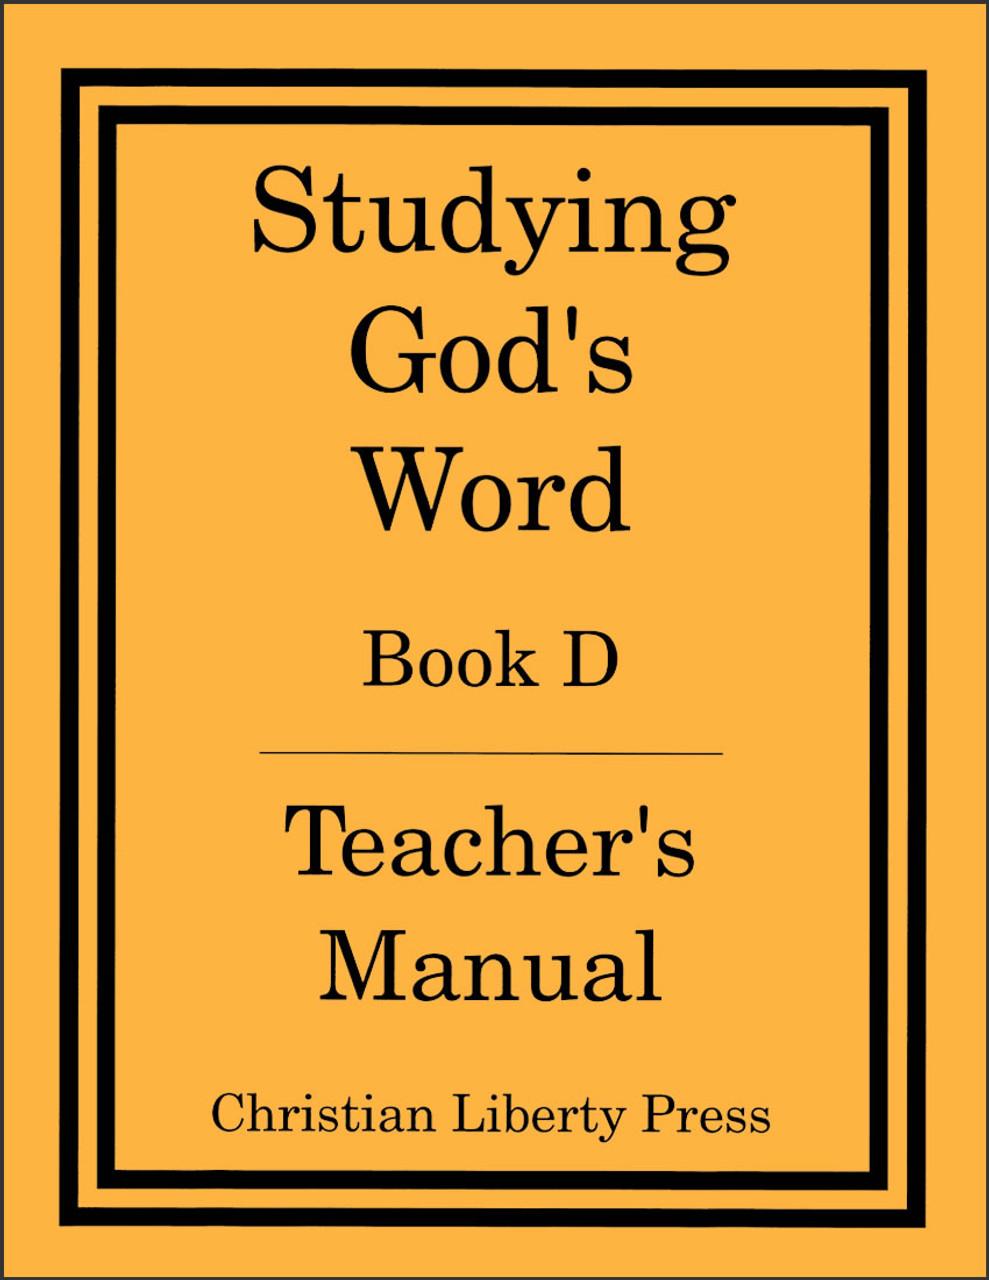 Studying God's Word Book D Teacher's Manual